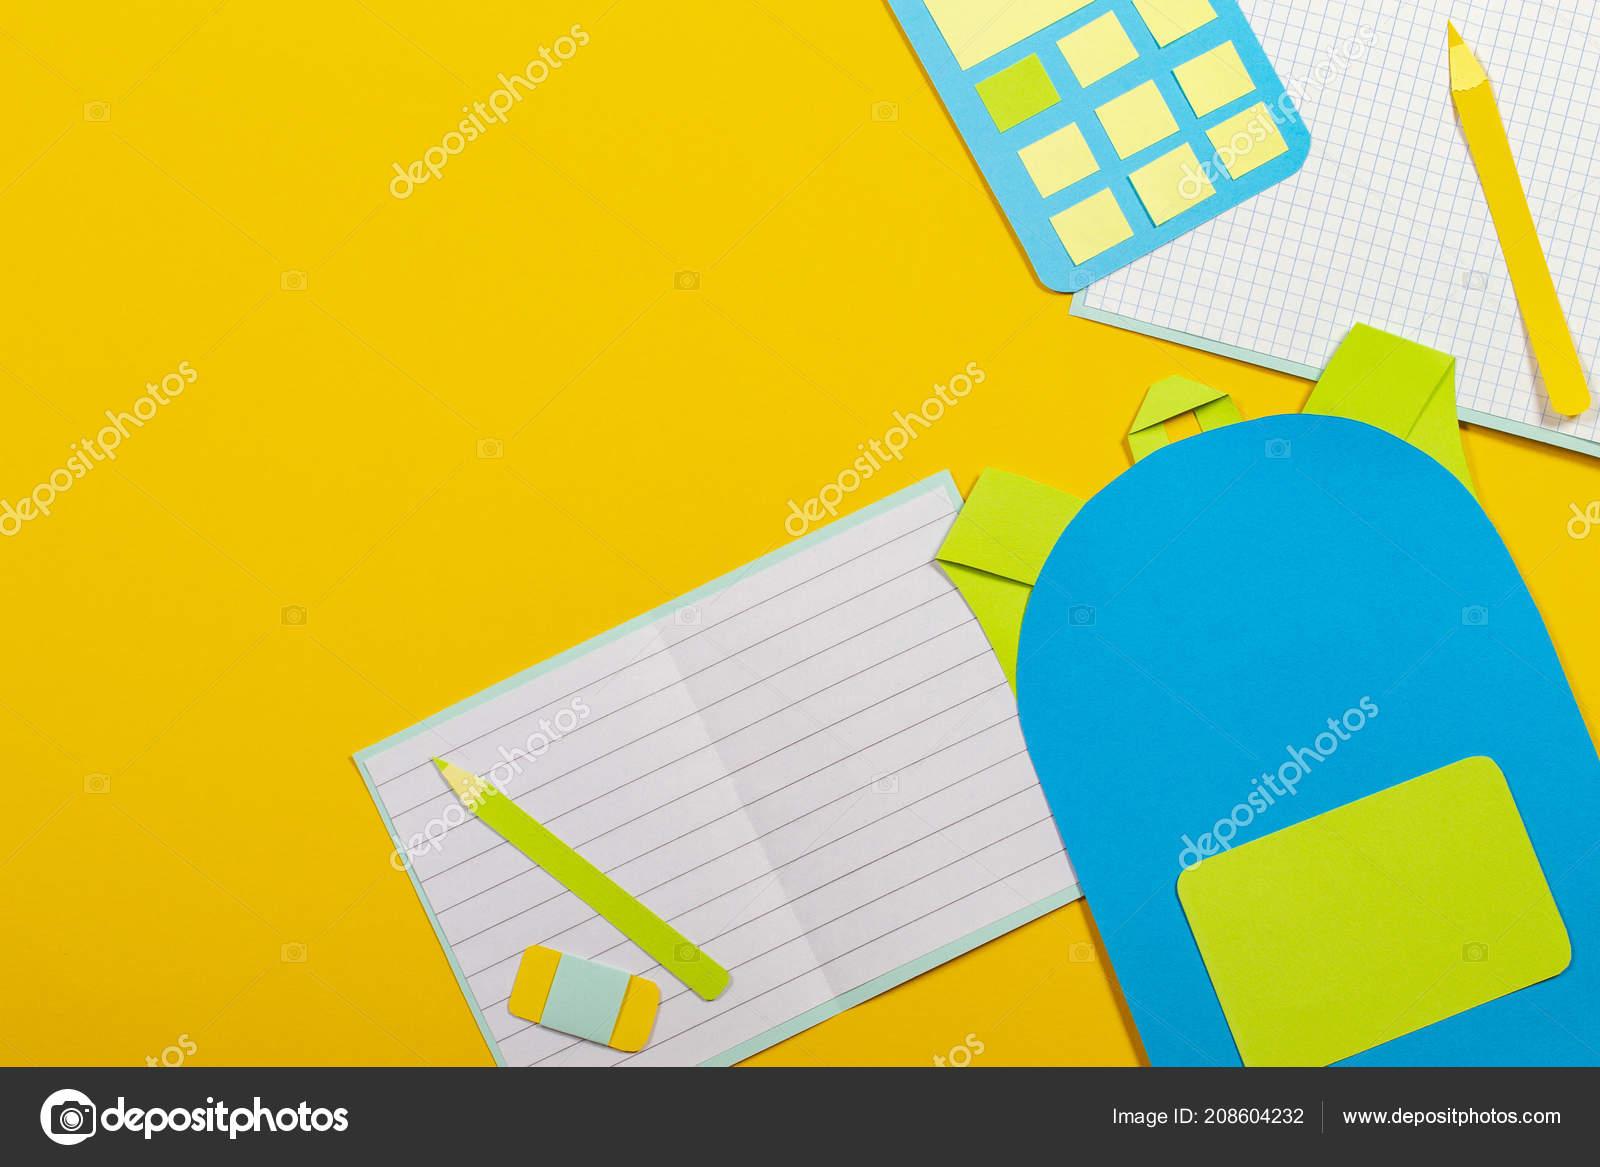 c252a02ff67 Σχολή εκπαίδευσης papercut φόντο. Σχολική τσάντα σακίδιο, σημειωματάρια  βιβλία και χαρτί αριθμομηχανή κομμένα σε κίτρινο φόντο. Το Top view — Εικόνα  από ...